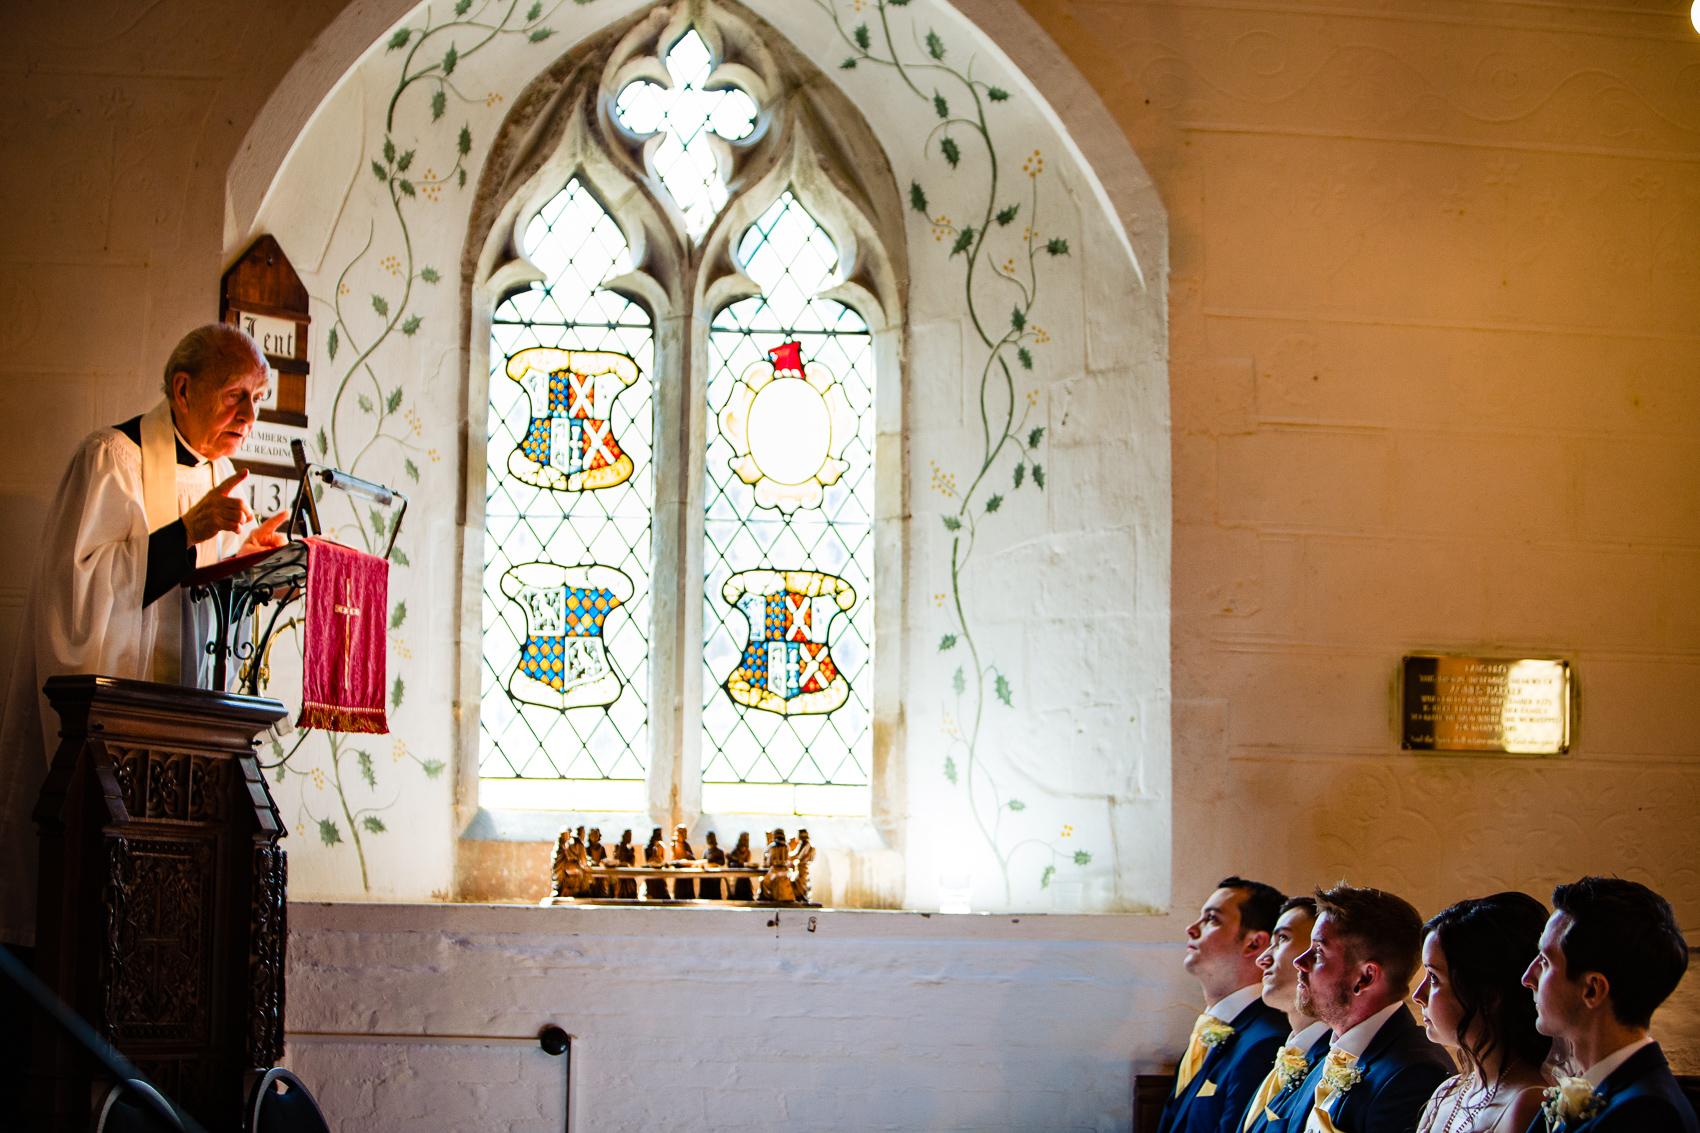 Vicar at St Leonard's Church Sherfield on Loddon